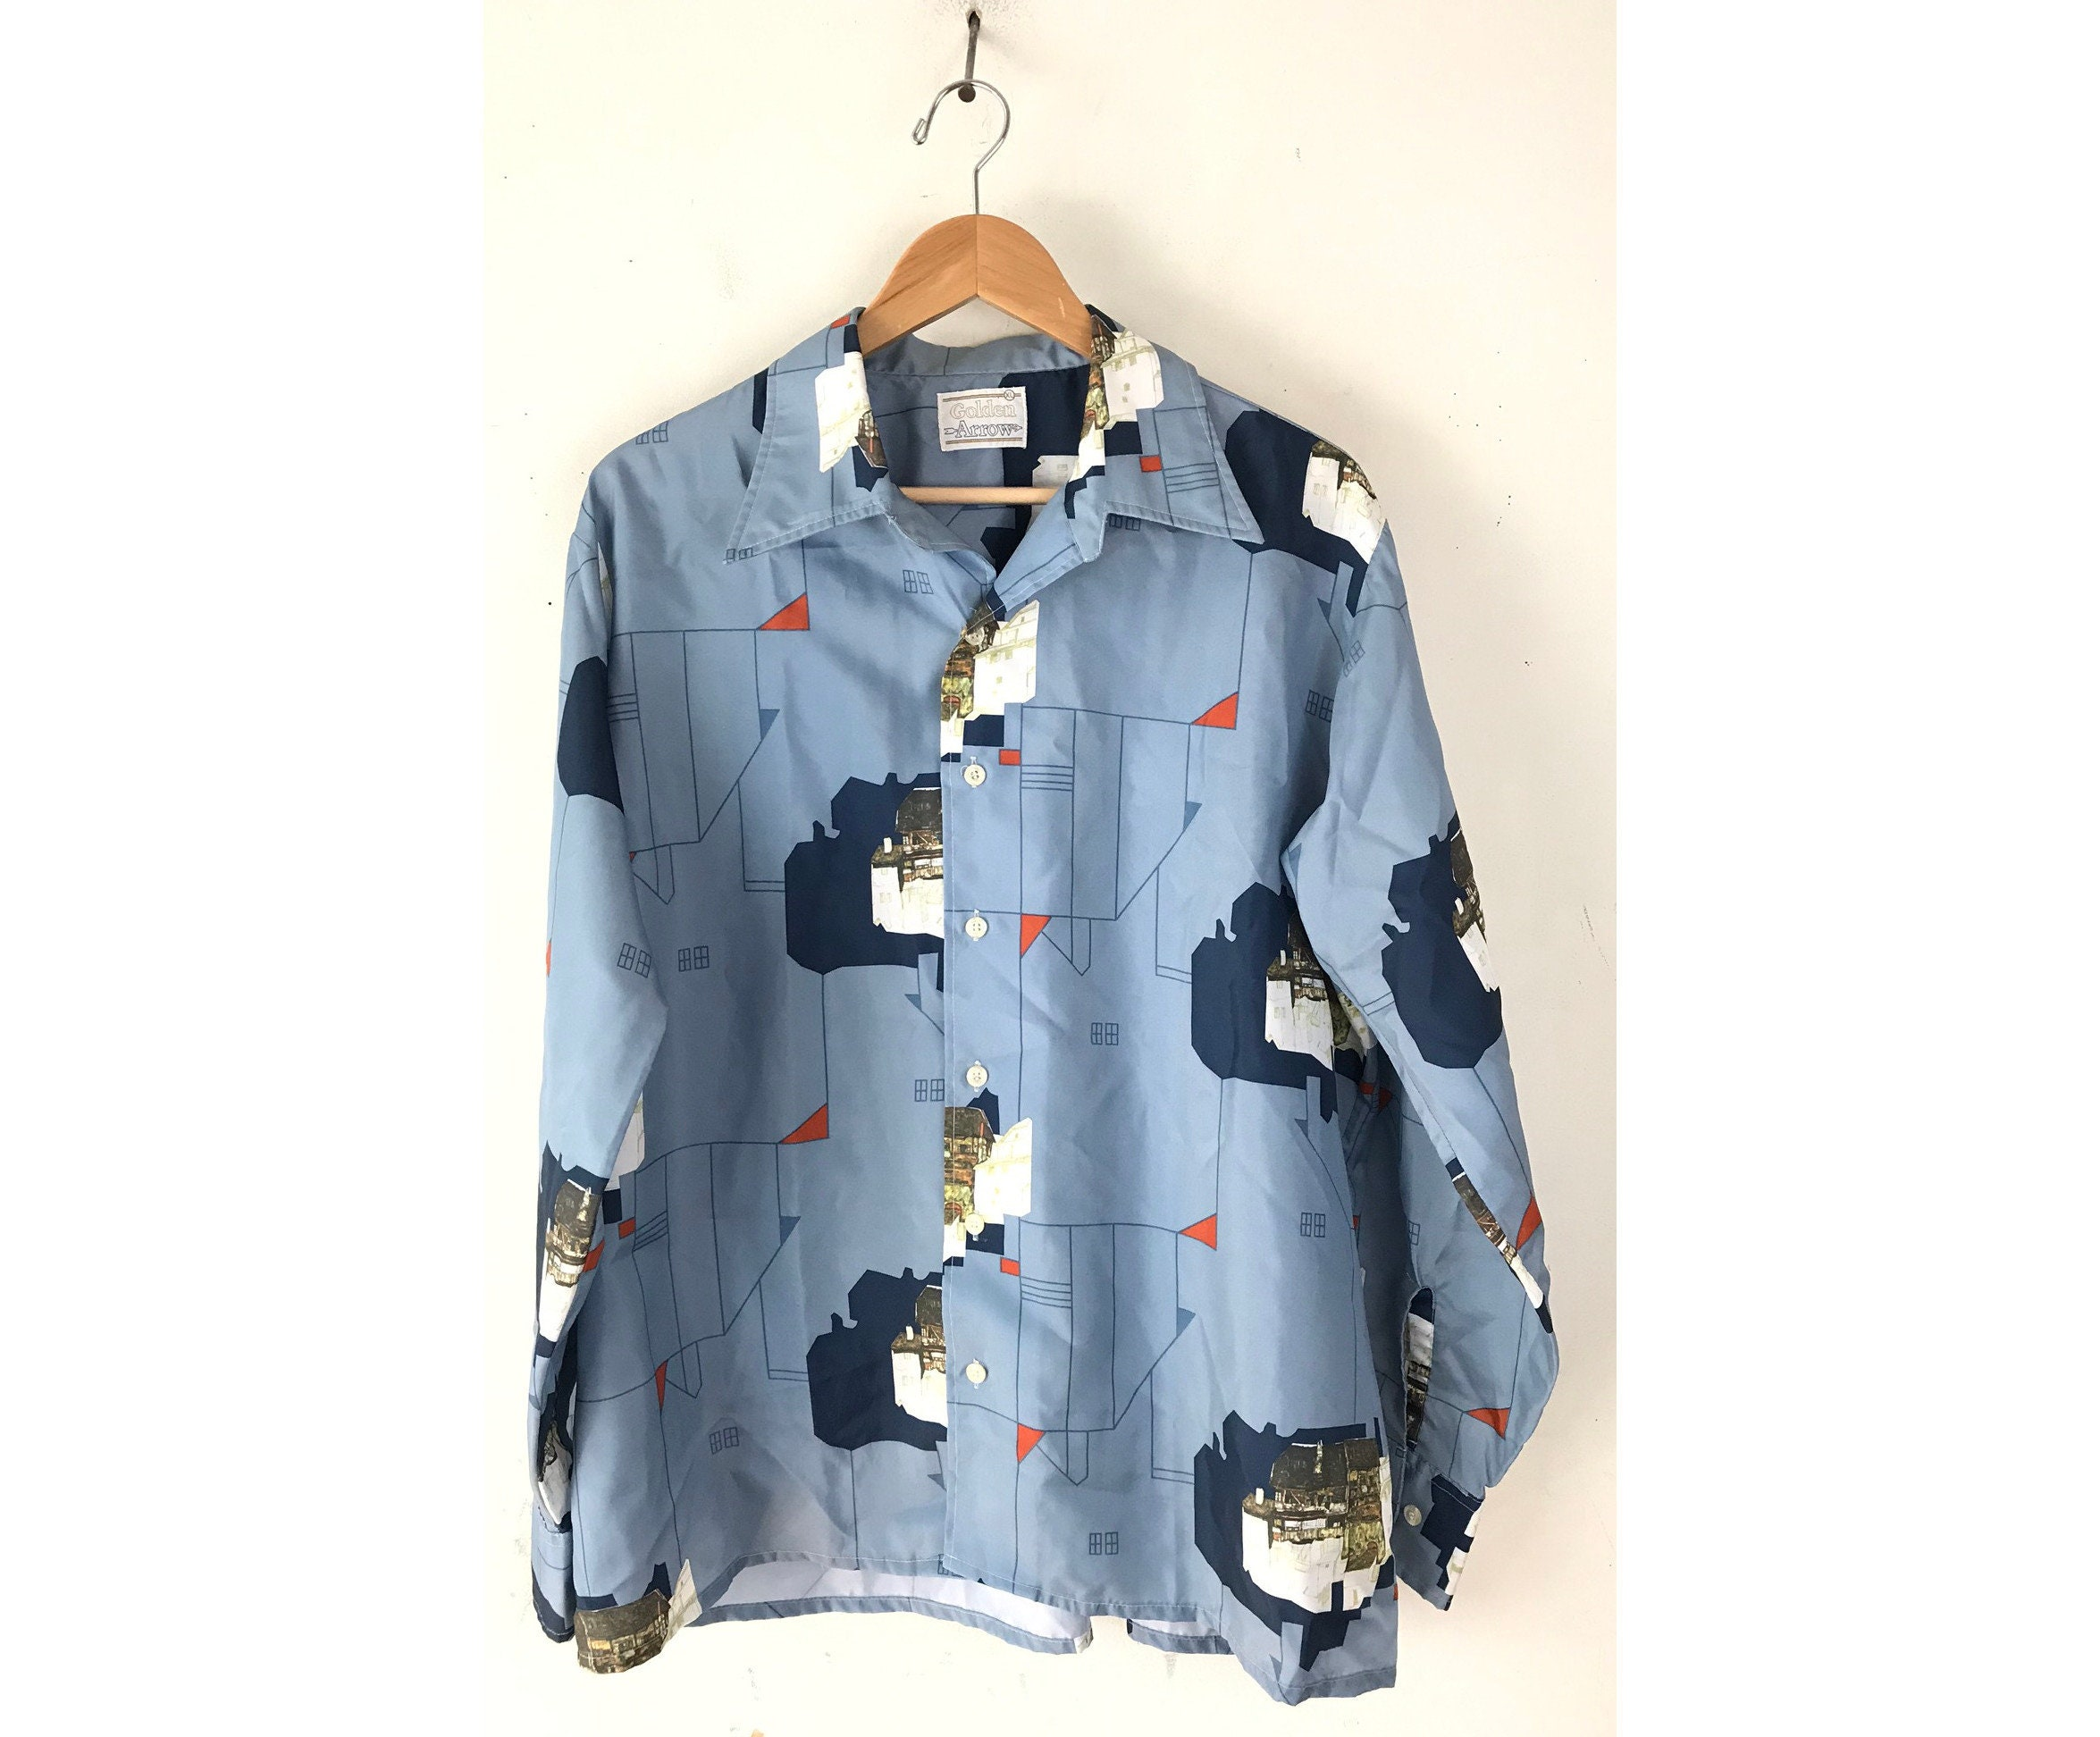 1970s Mens Shirt Styles – Vintage 70s Shirts for Guys 70S House Print Disco Shirt Mens Xl, Blue Geometric Polyester Shirt, Vintage Retro Architecture $26.00 AT vintagedancer.com